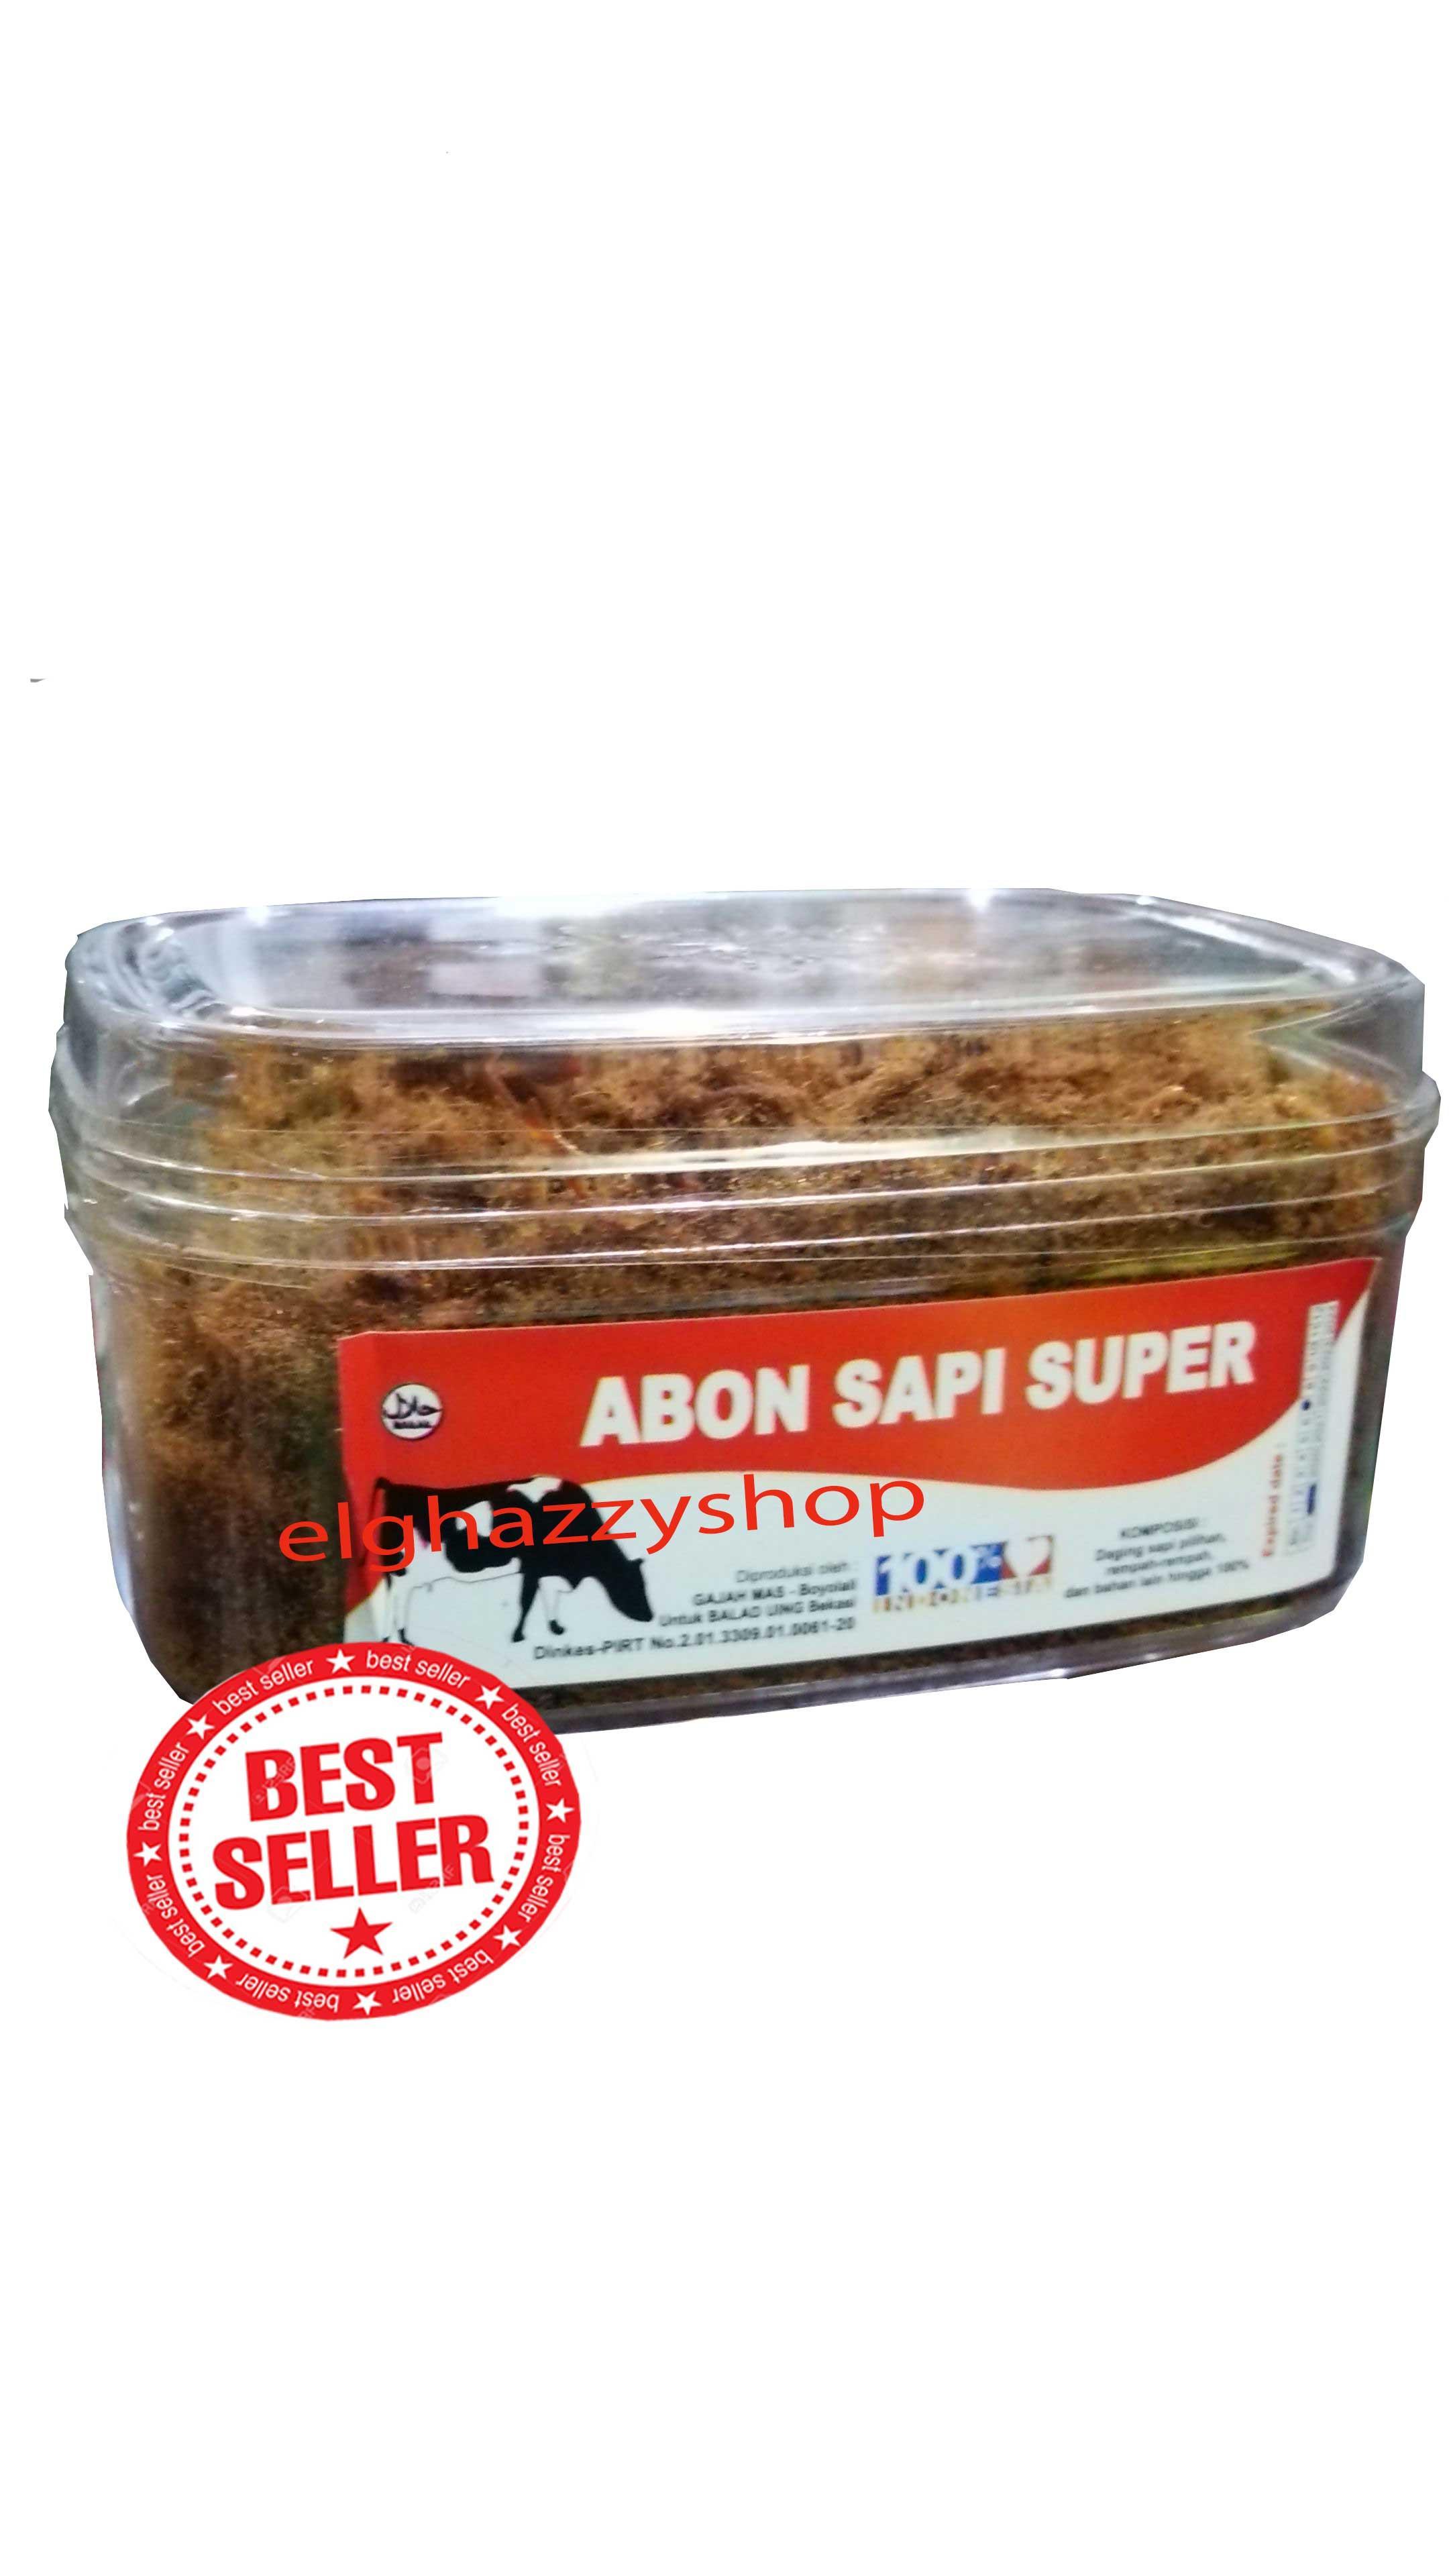 Abon Sapi Super Rasa Original Sangat Lezat & Gurih